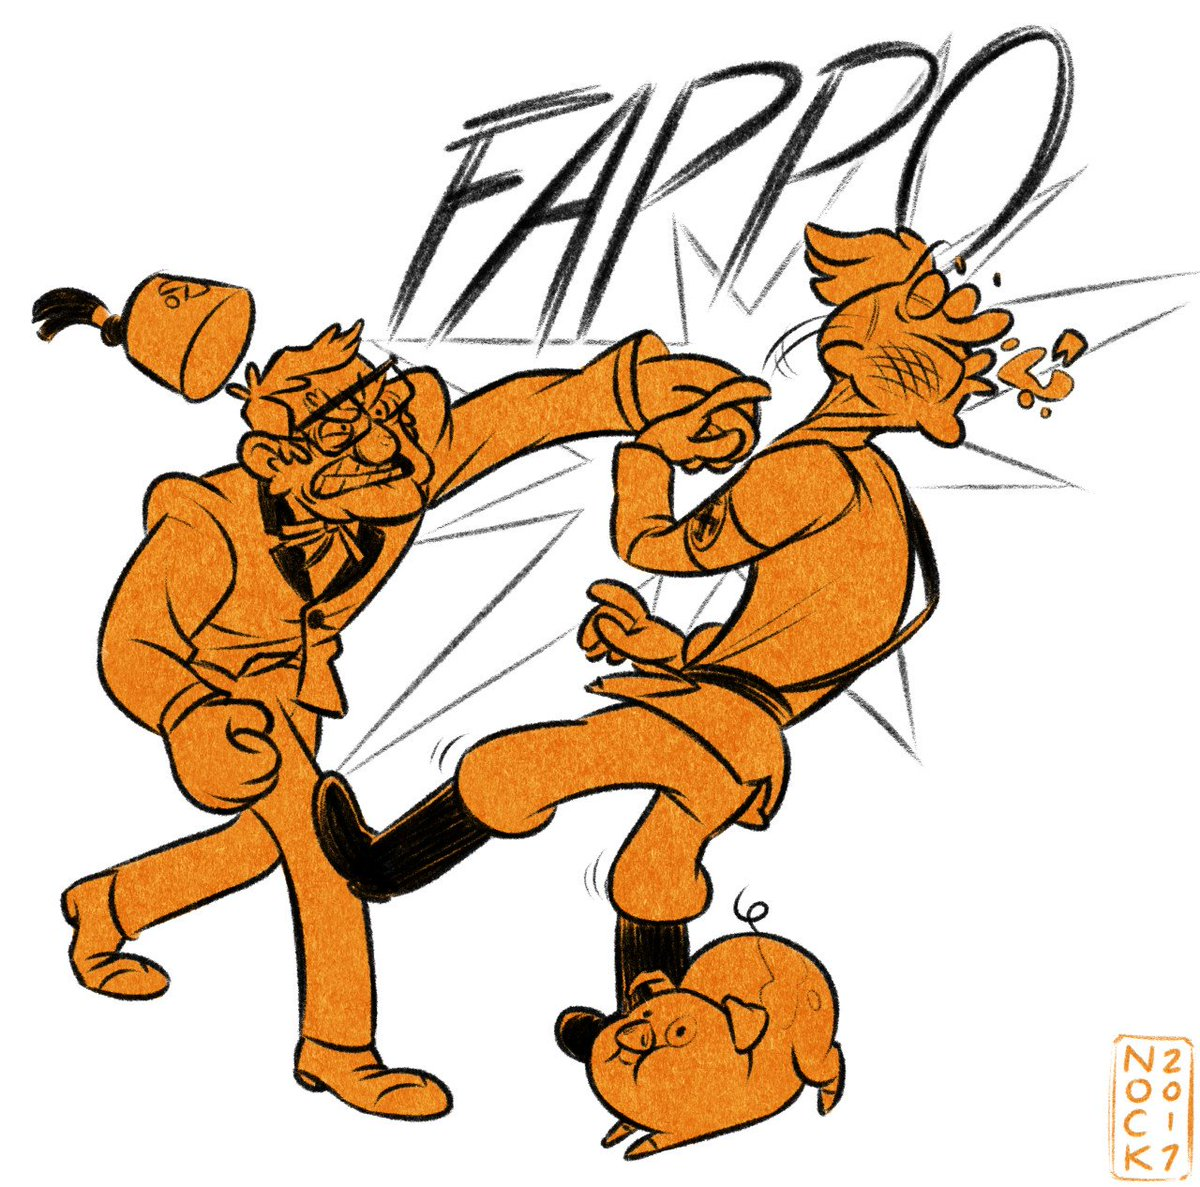 @_AlexHirsch Good thing I love drawing fictional people punching Nazis! https://t.co/9JVQnXr6dO